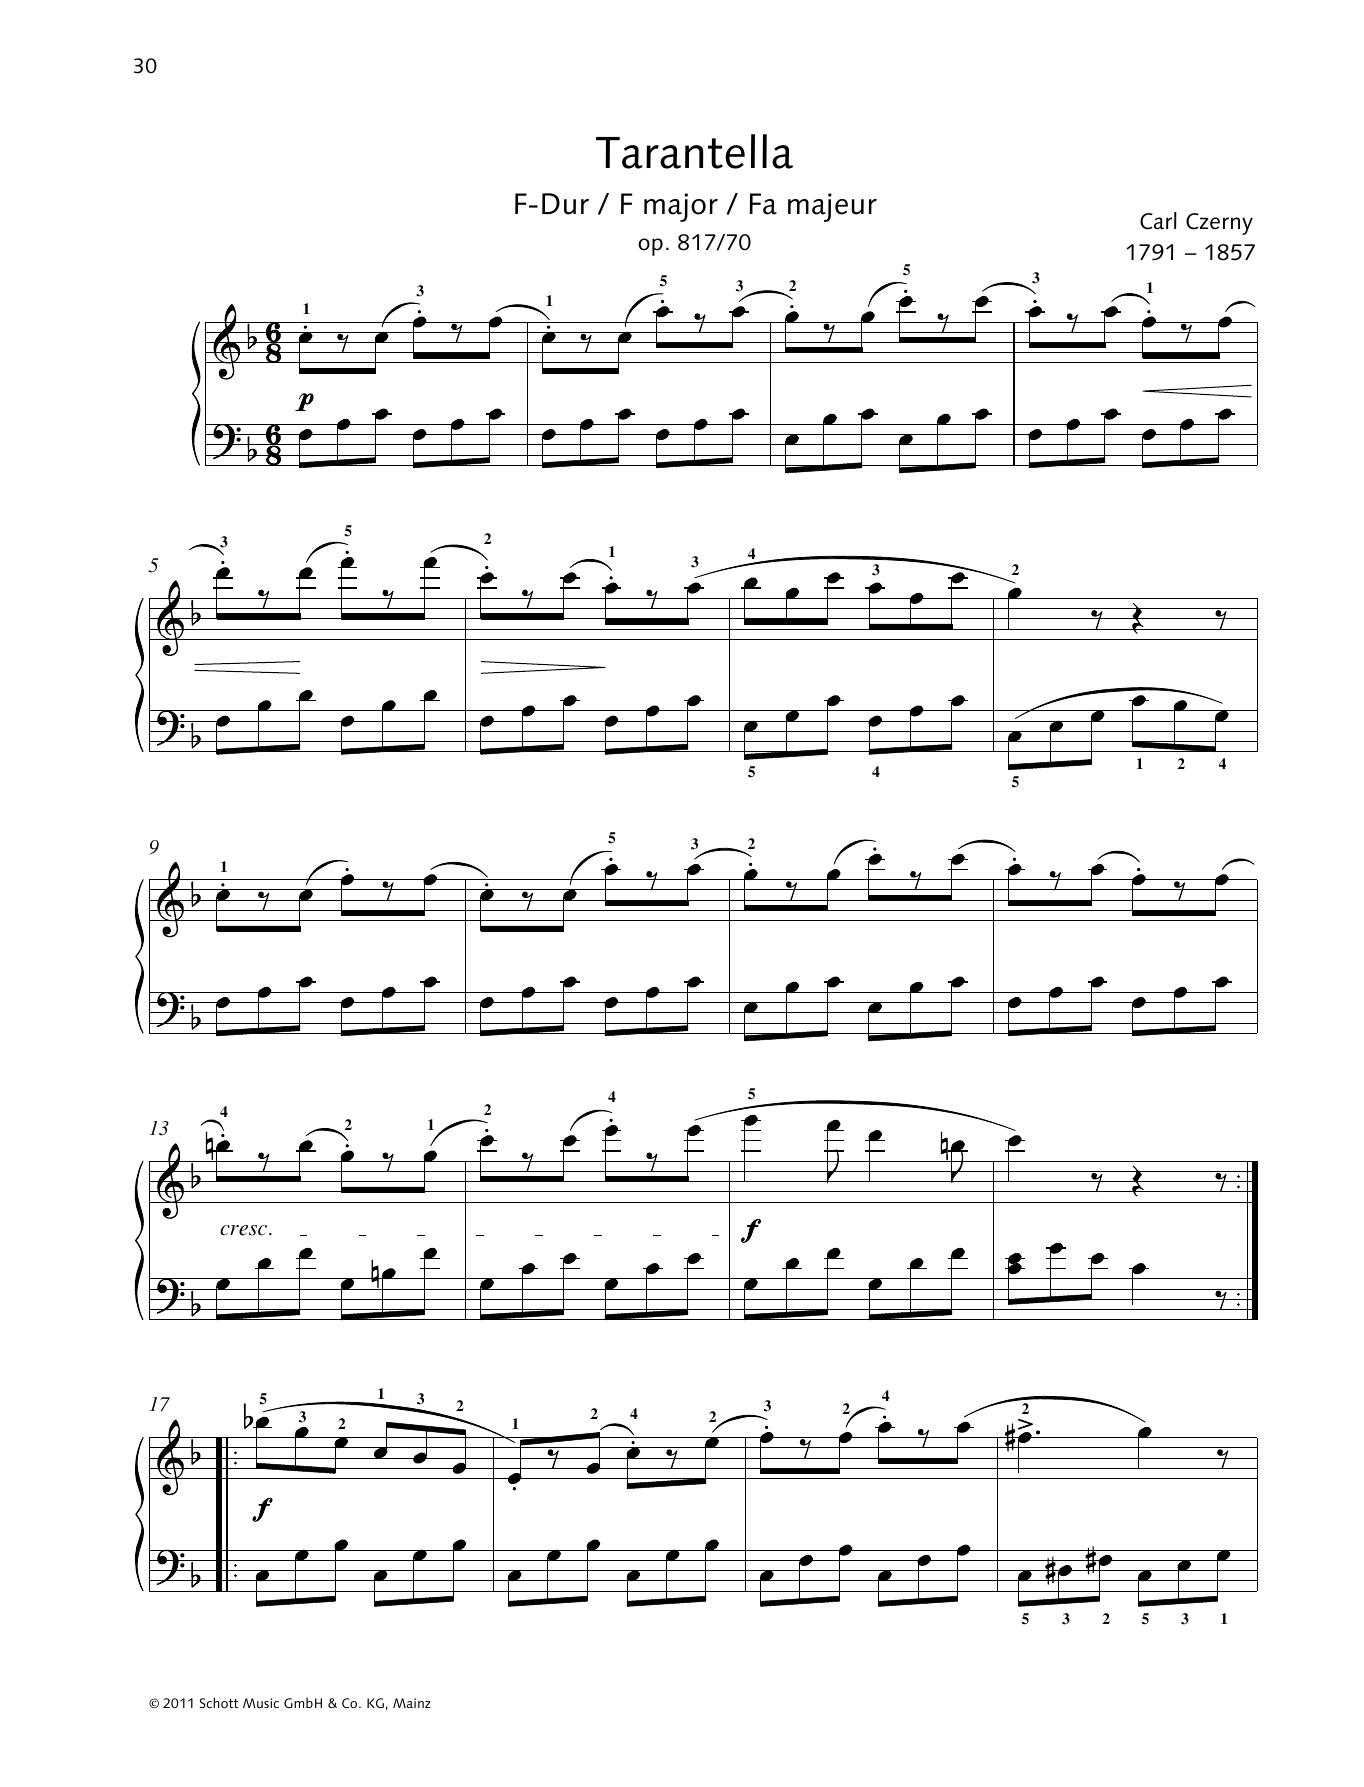 Tarantella F major